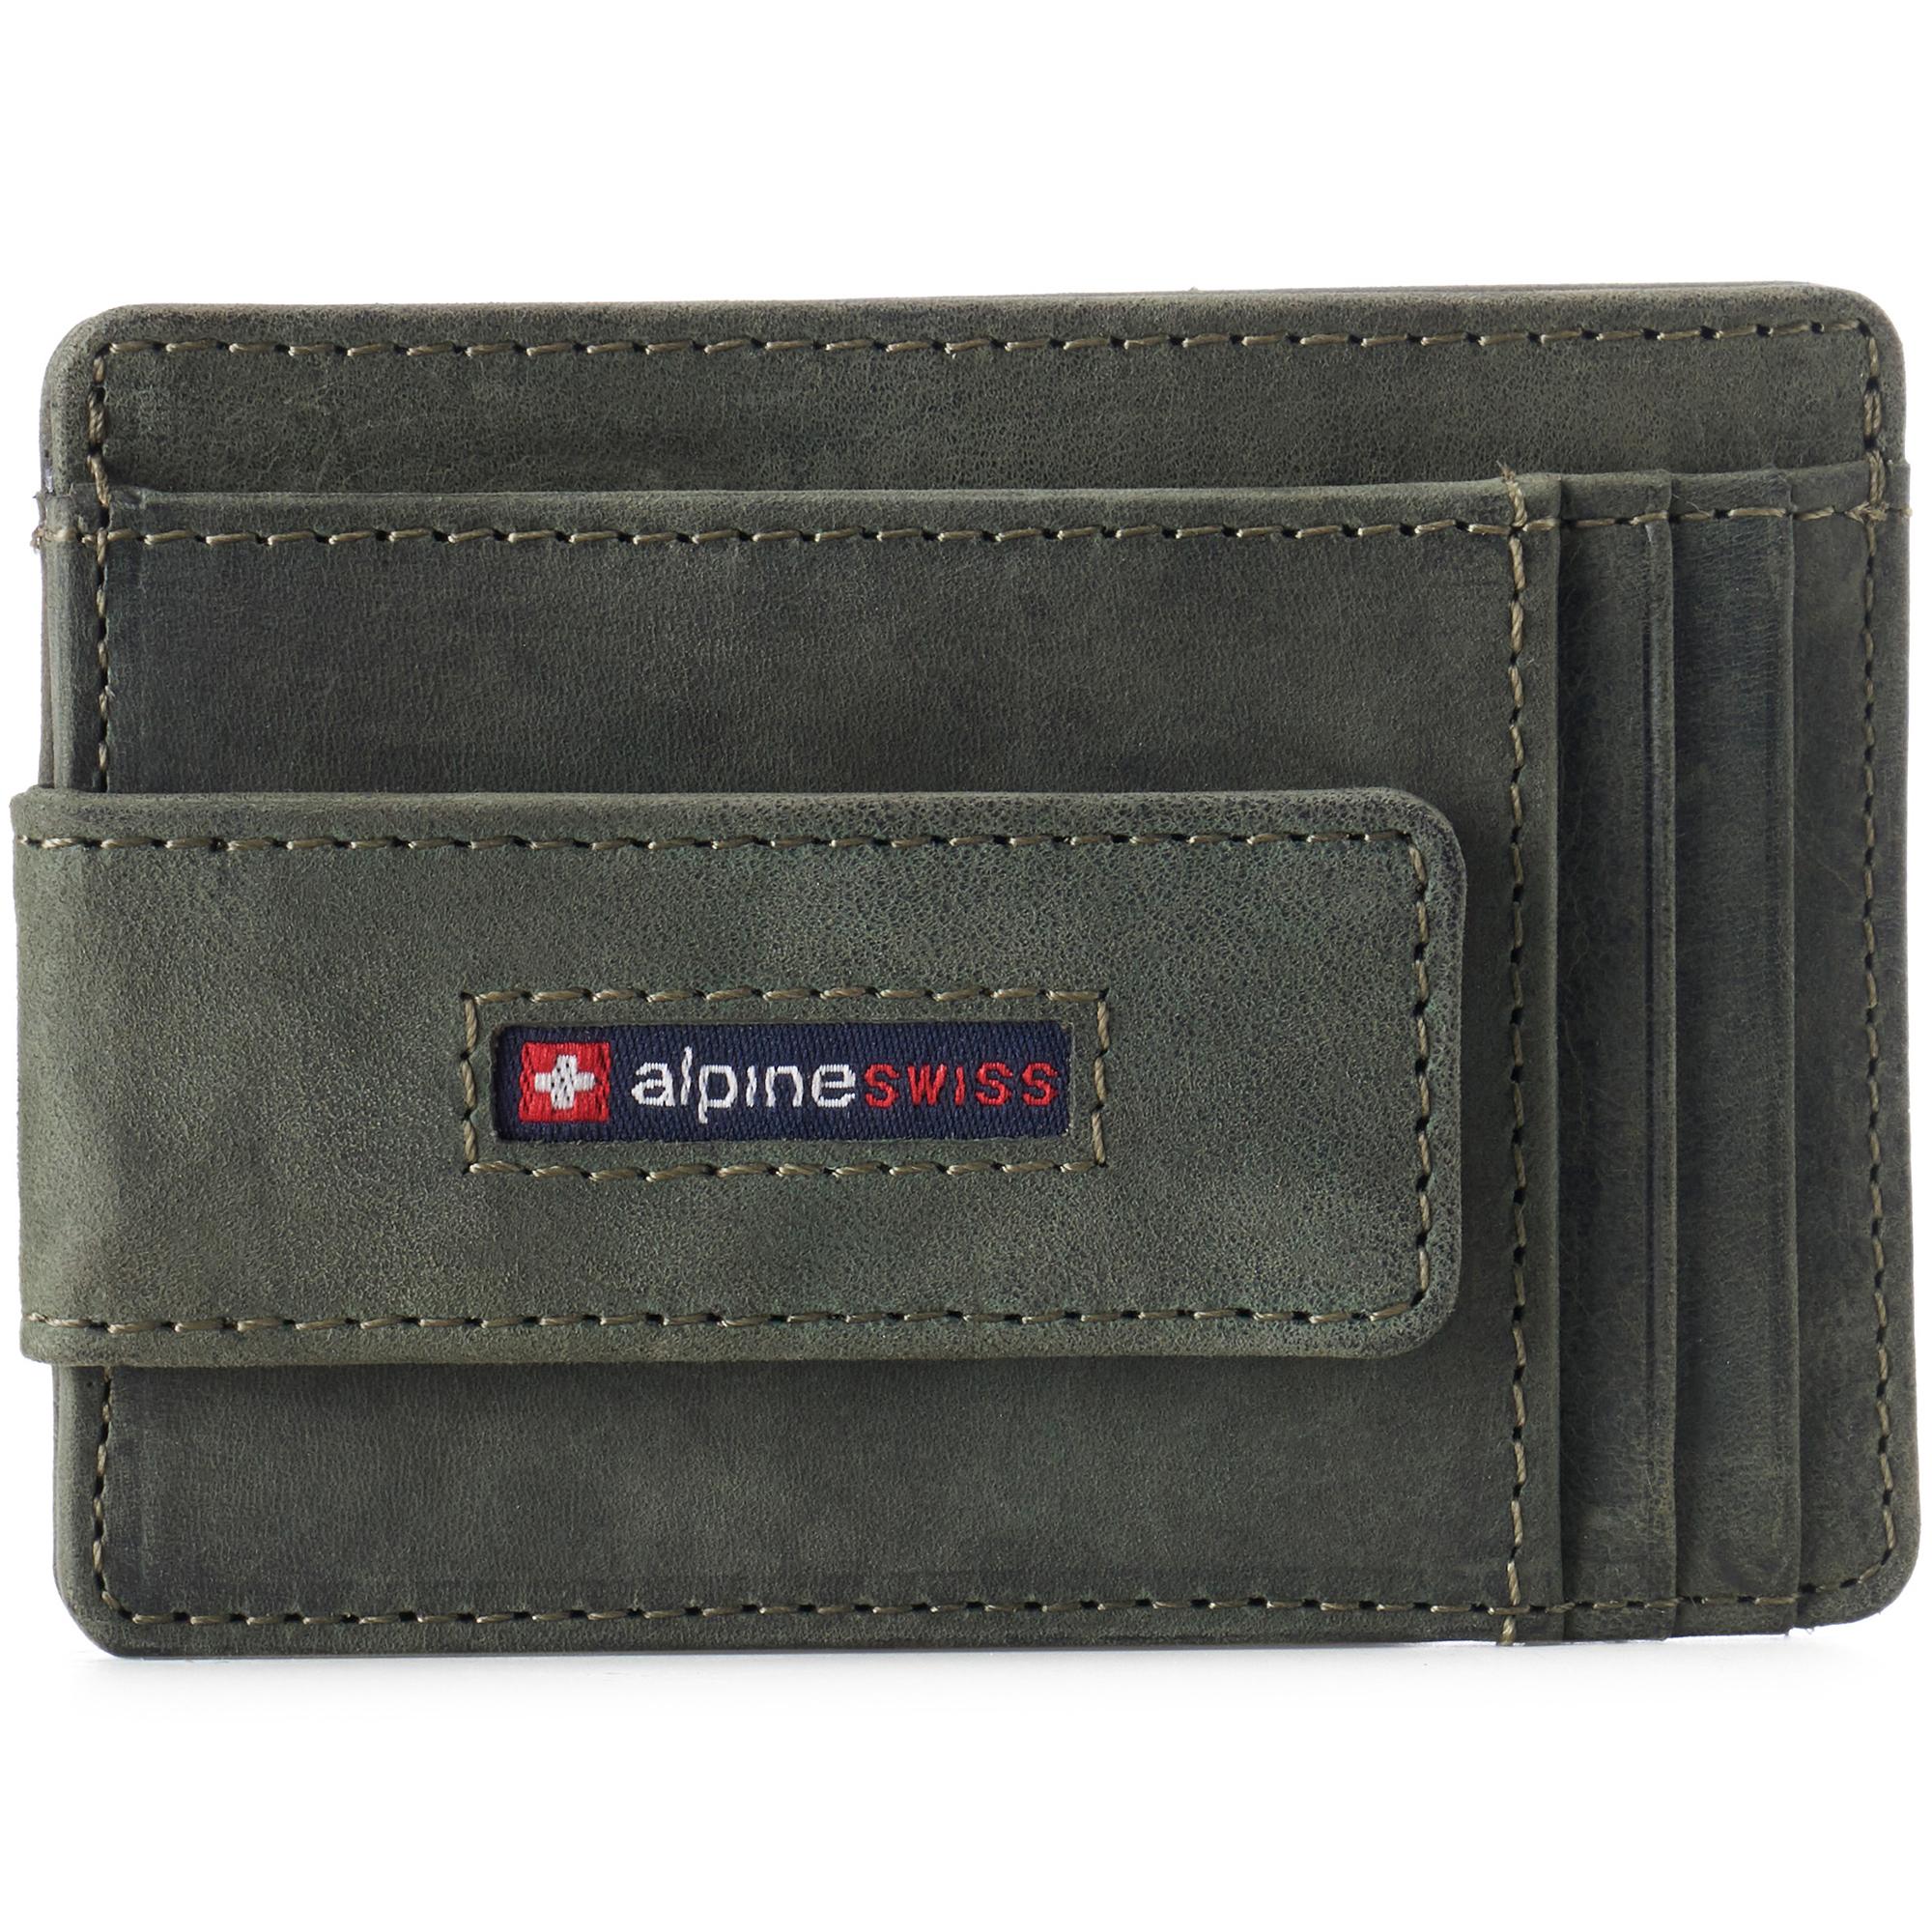 thumbnail 48 - Alpine Swiss Mens RFID Safe Slim Magnetic Money Clip Leather Front Pocket Wallet